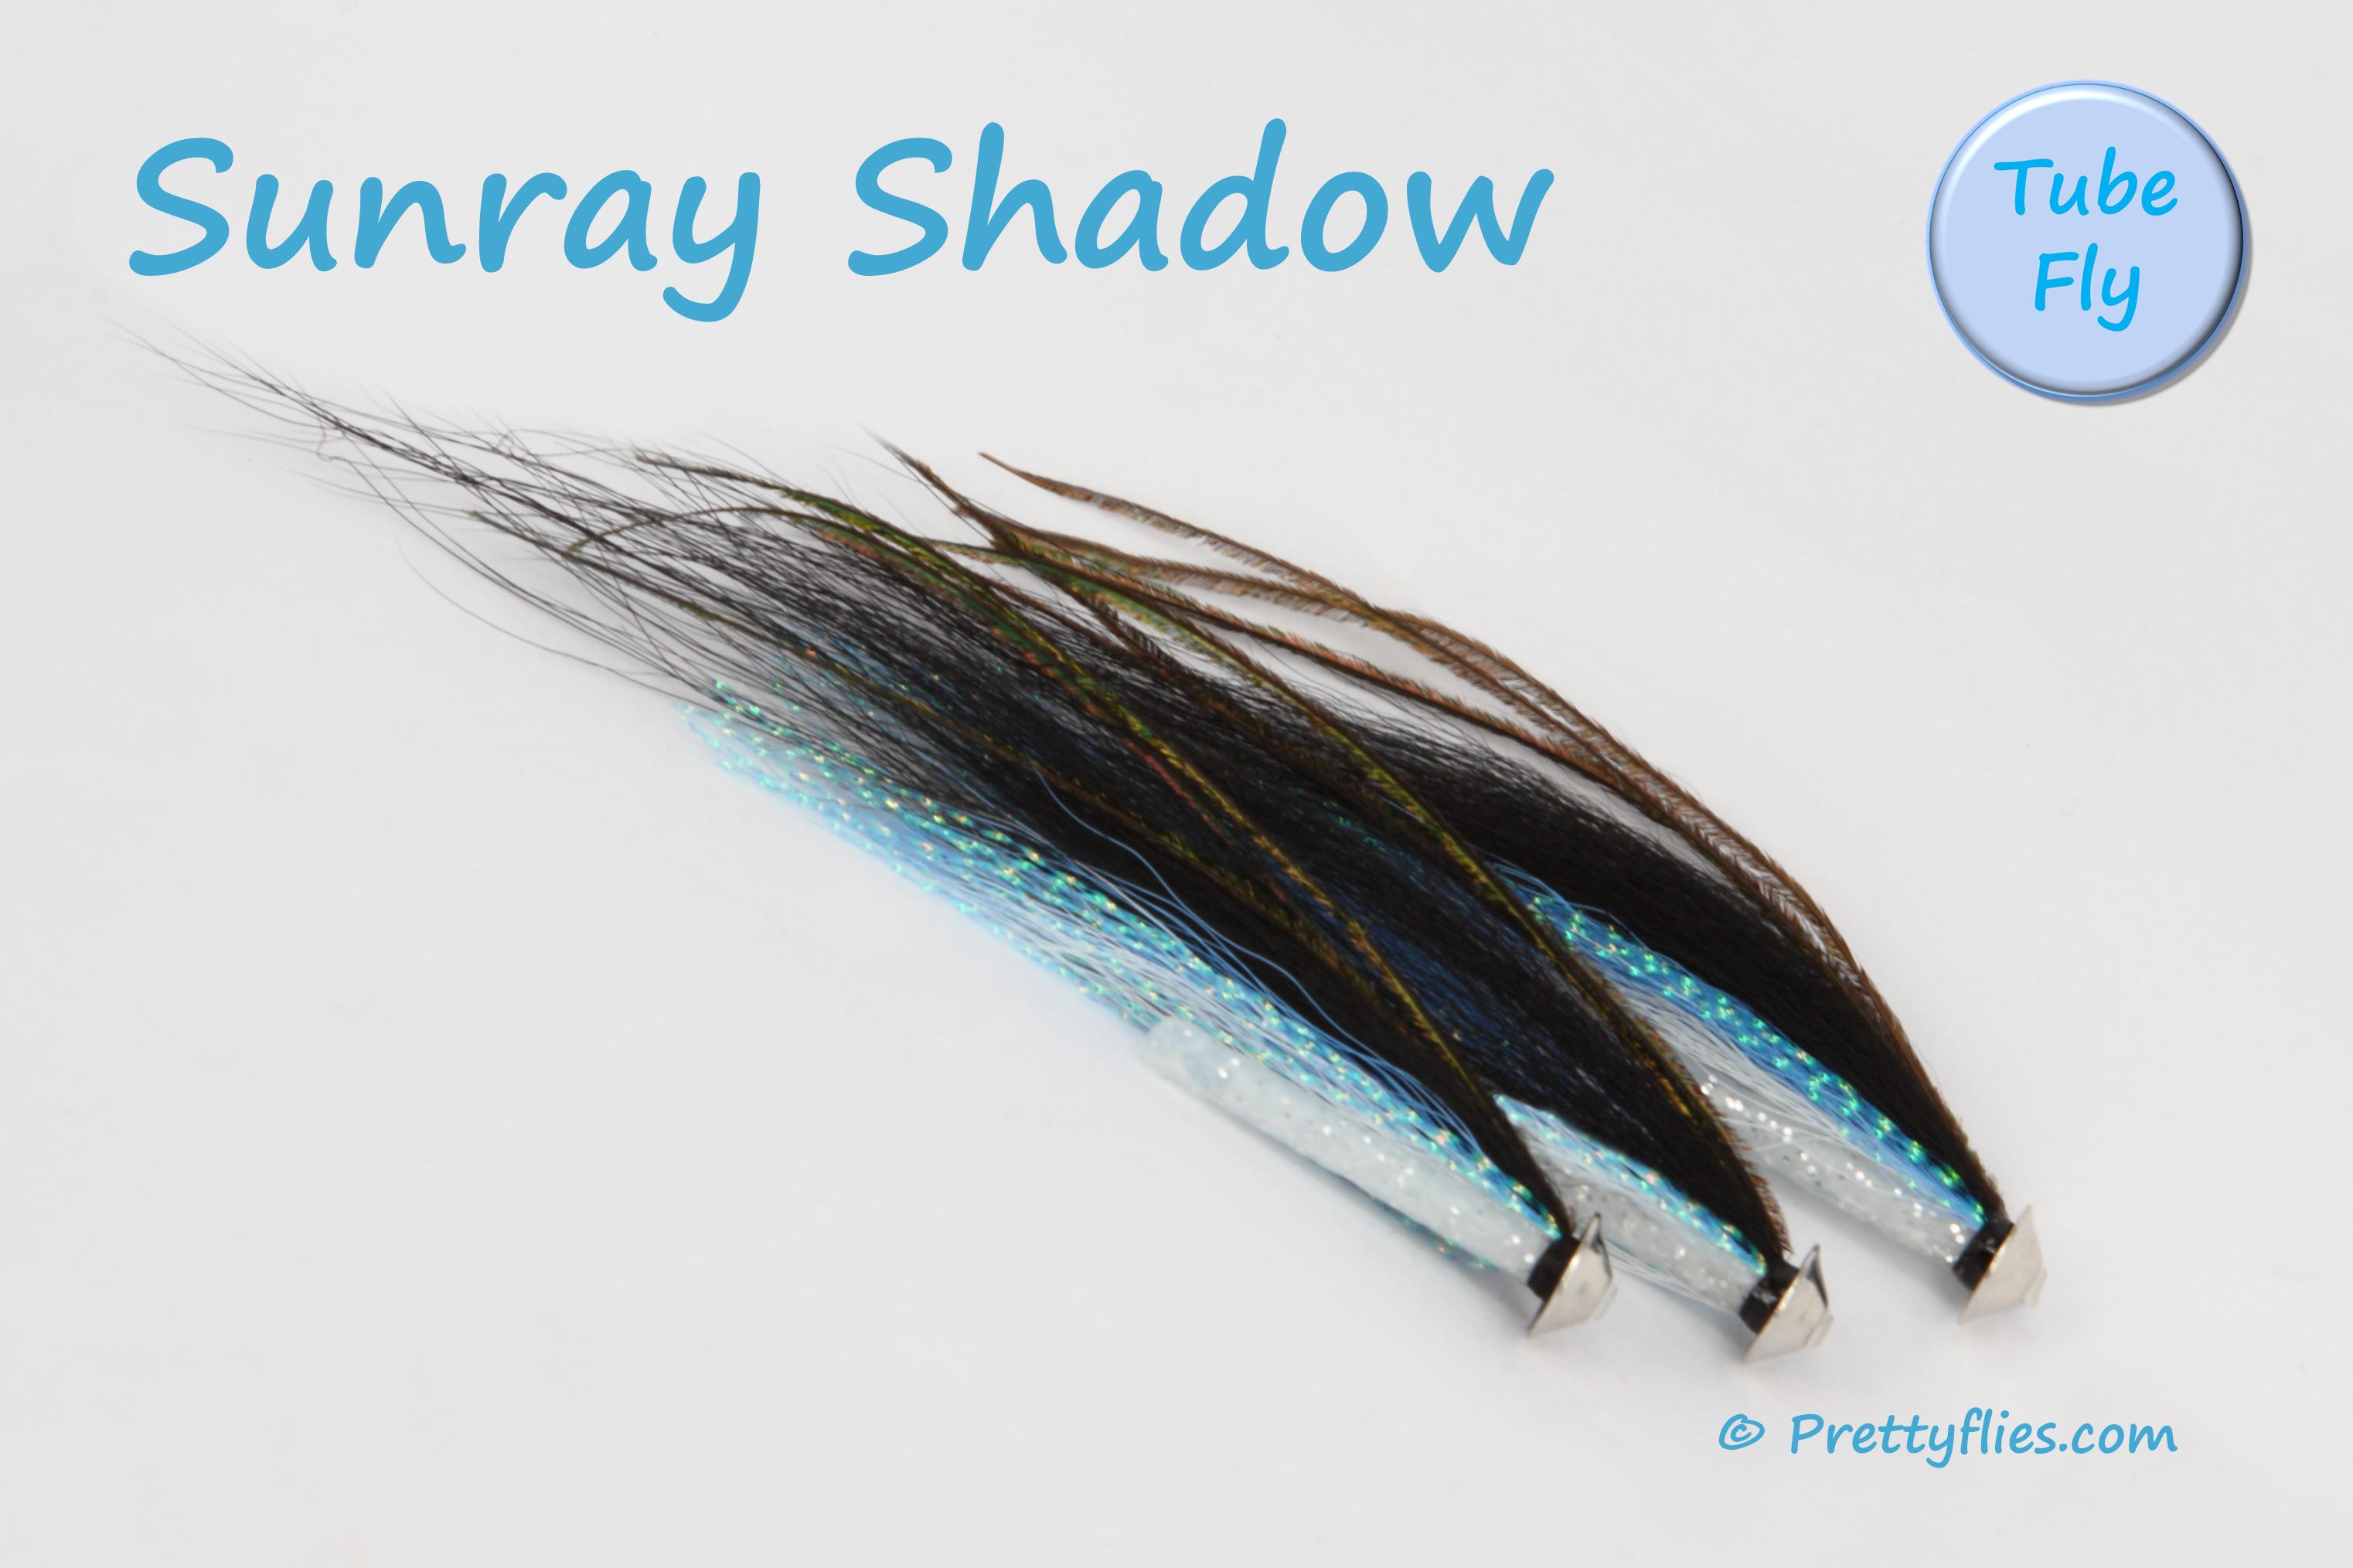 Sunray Shadows copy.jpg